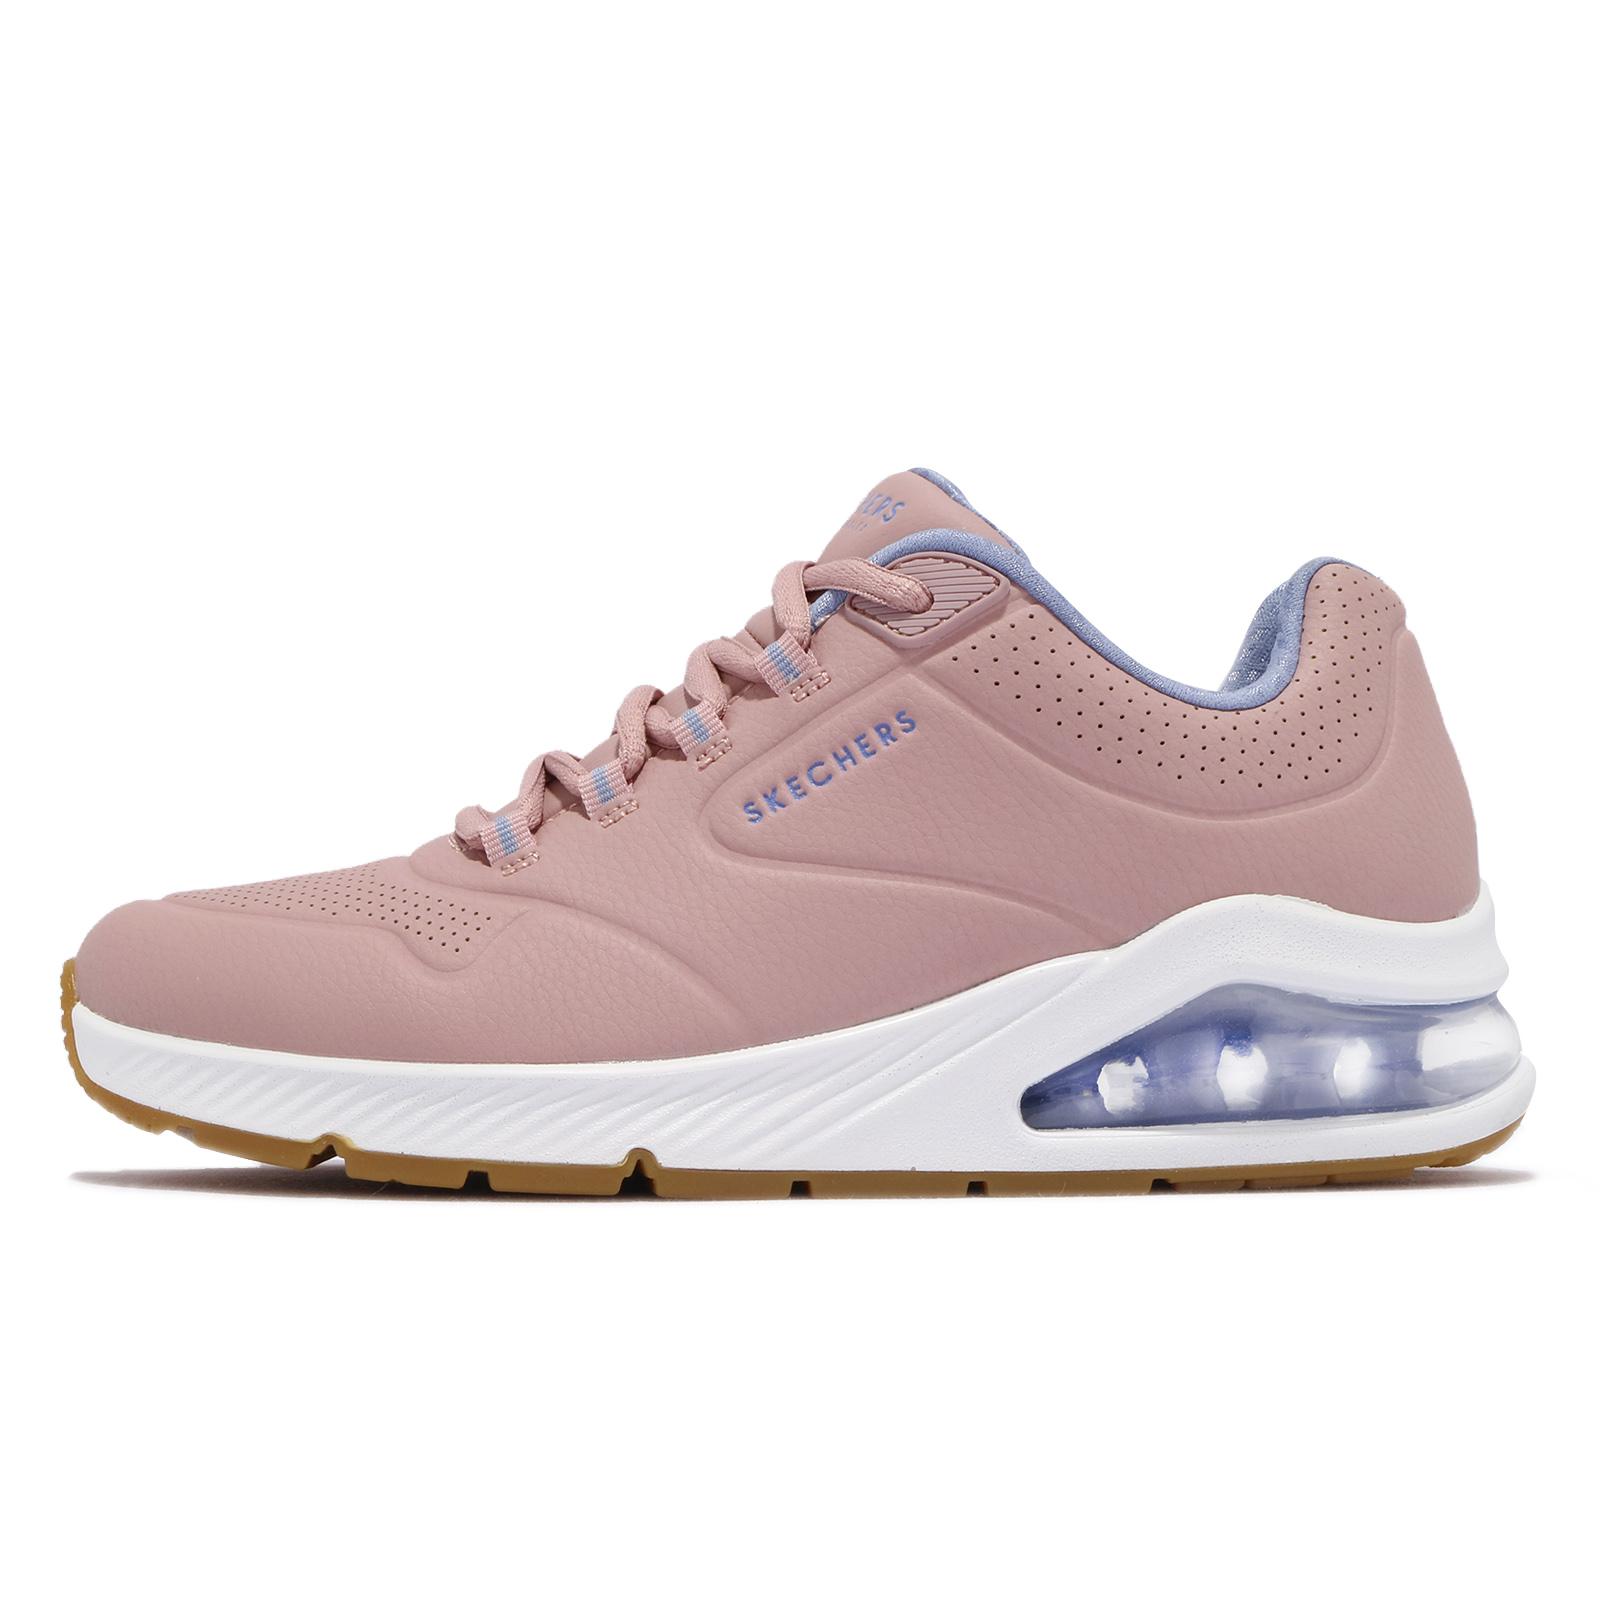 Skechers 休閒鞋 Uno 2 粉紅 藍 女鞋 氣墊 增高 運動鞋 【ACS】 155542MVE